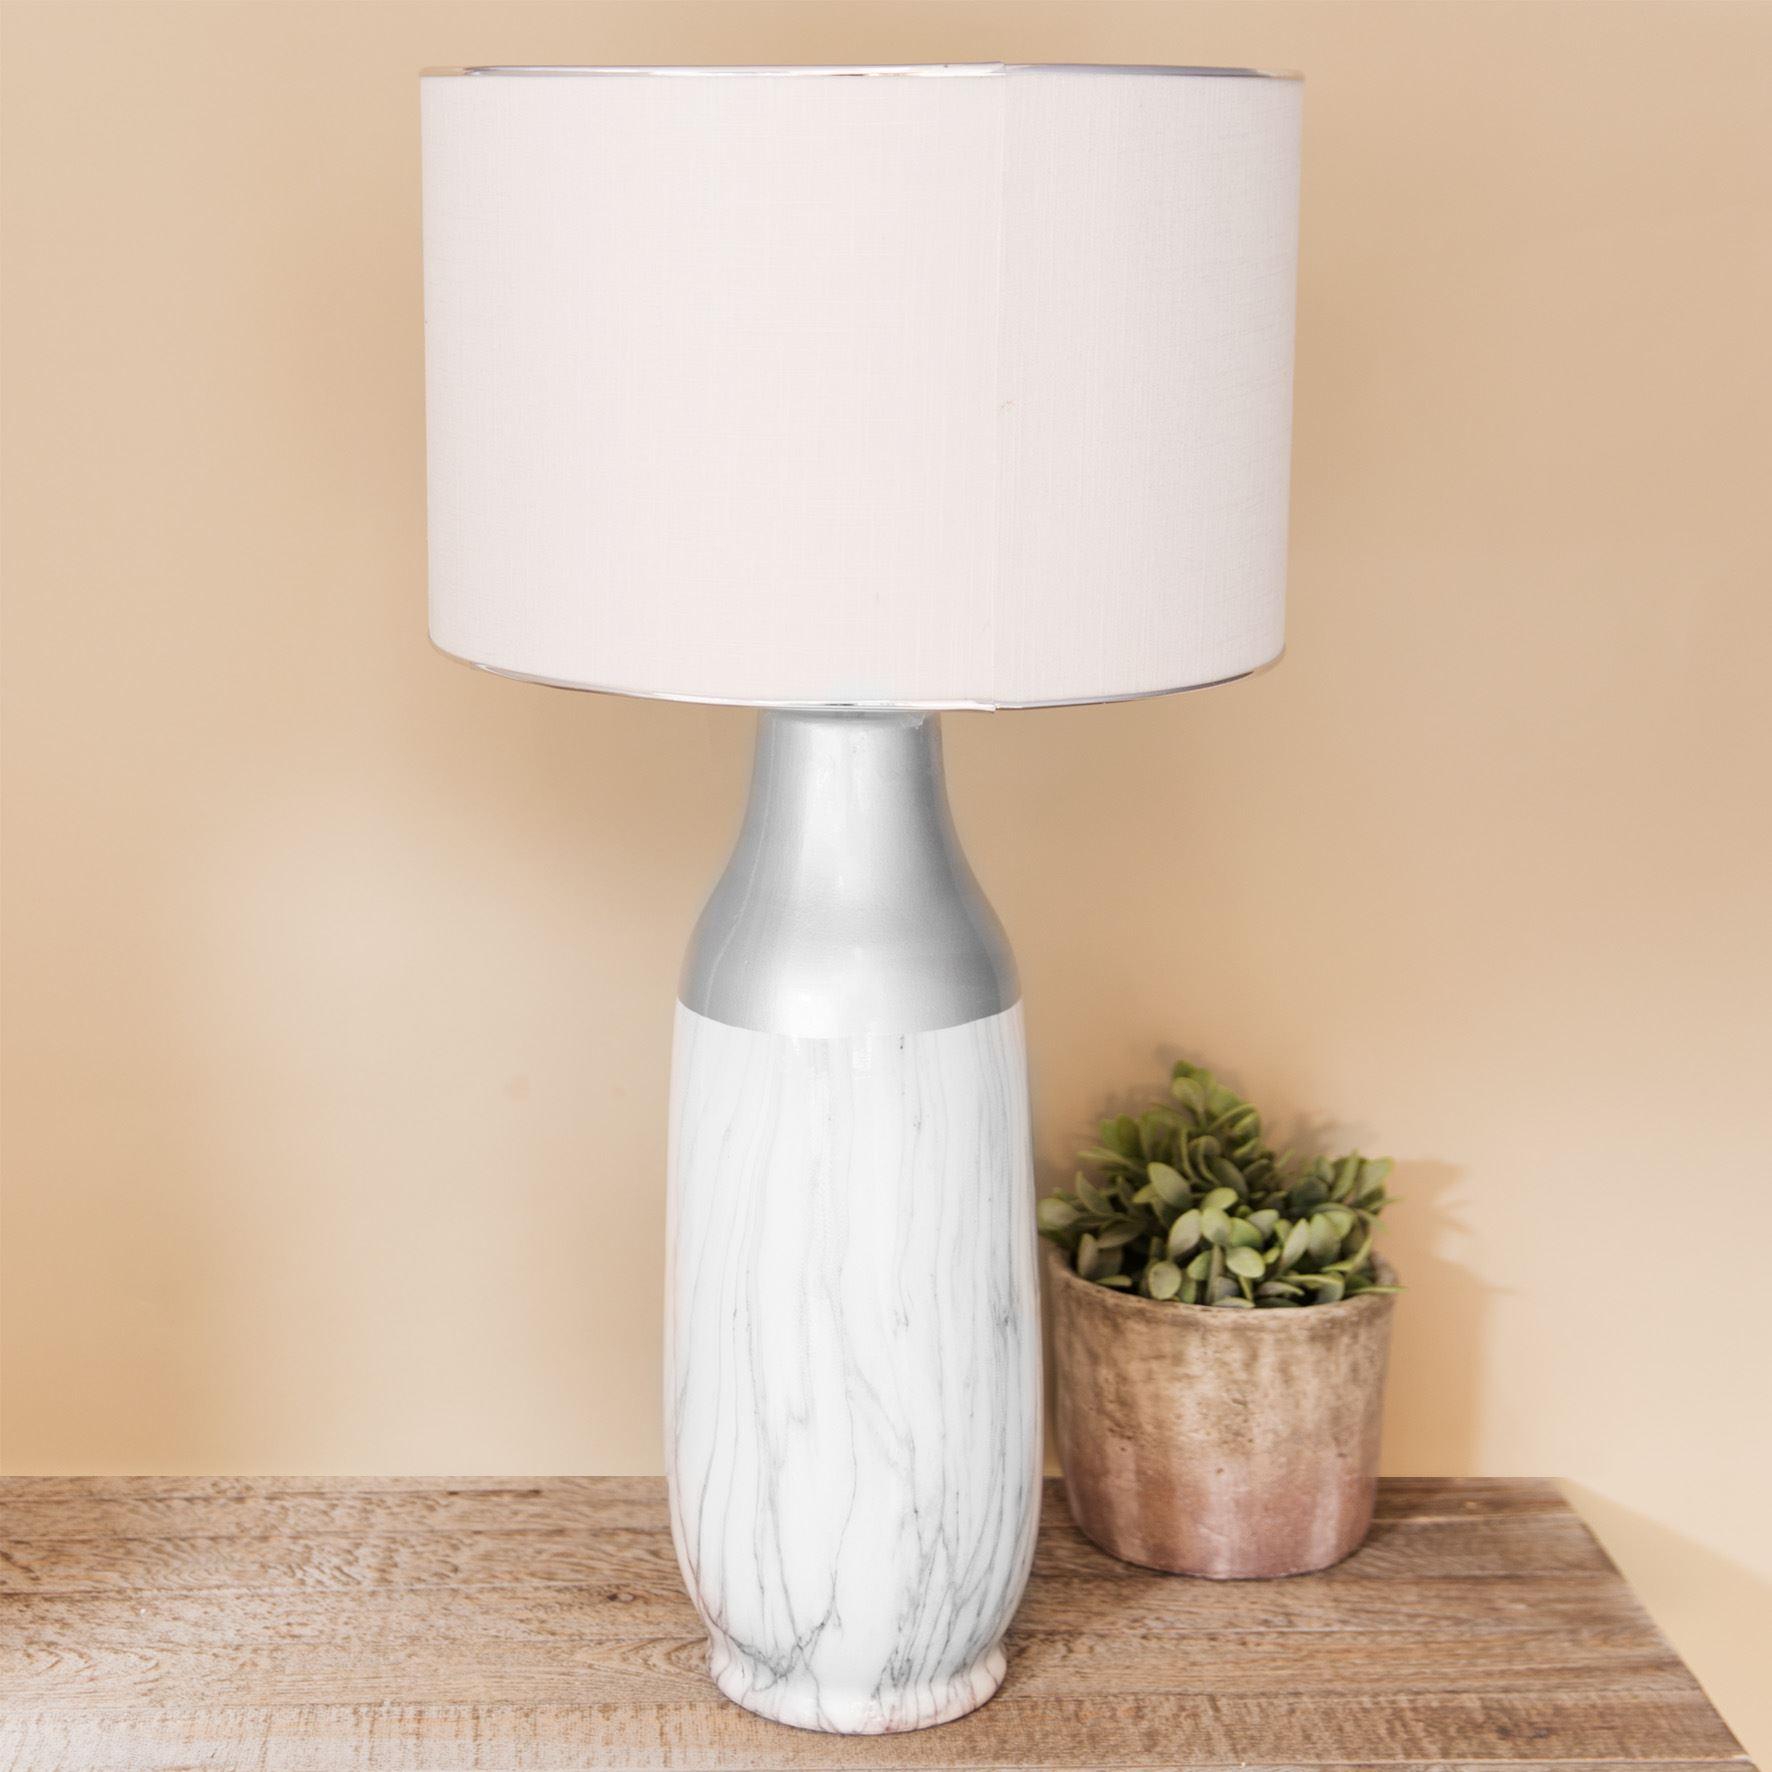 Hestia Ceramic Table Lamp Marble Effect Base